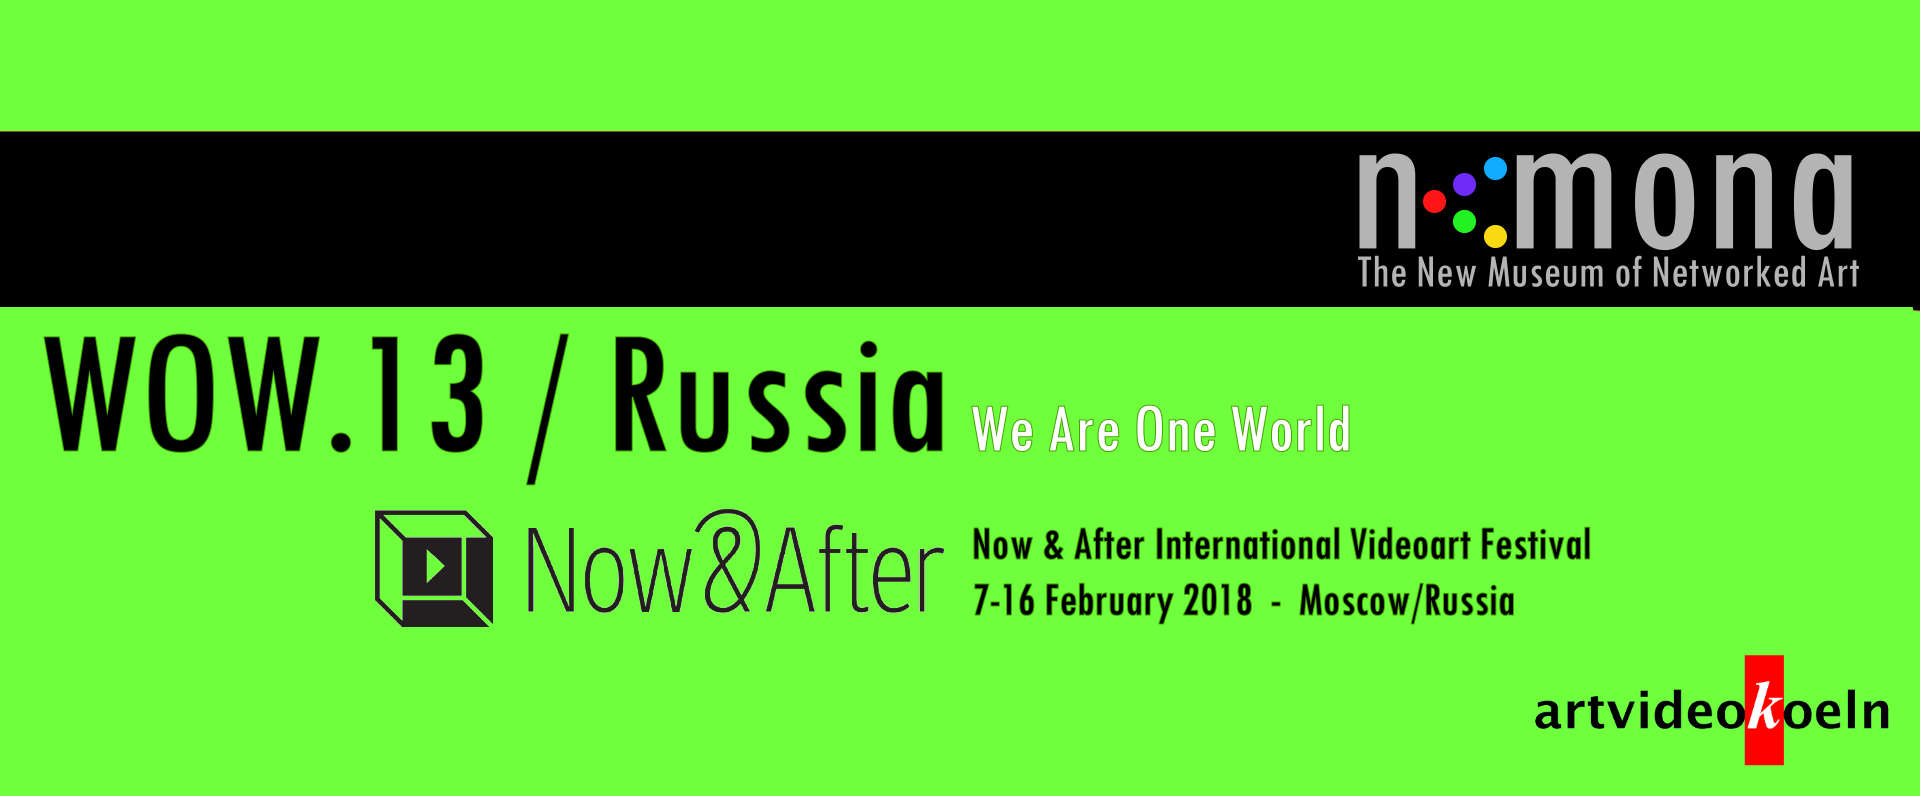 WOW.13 / Russia